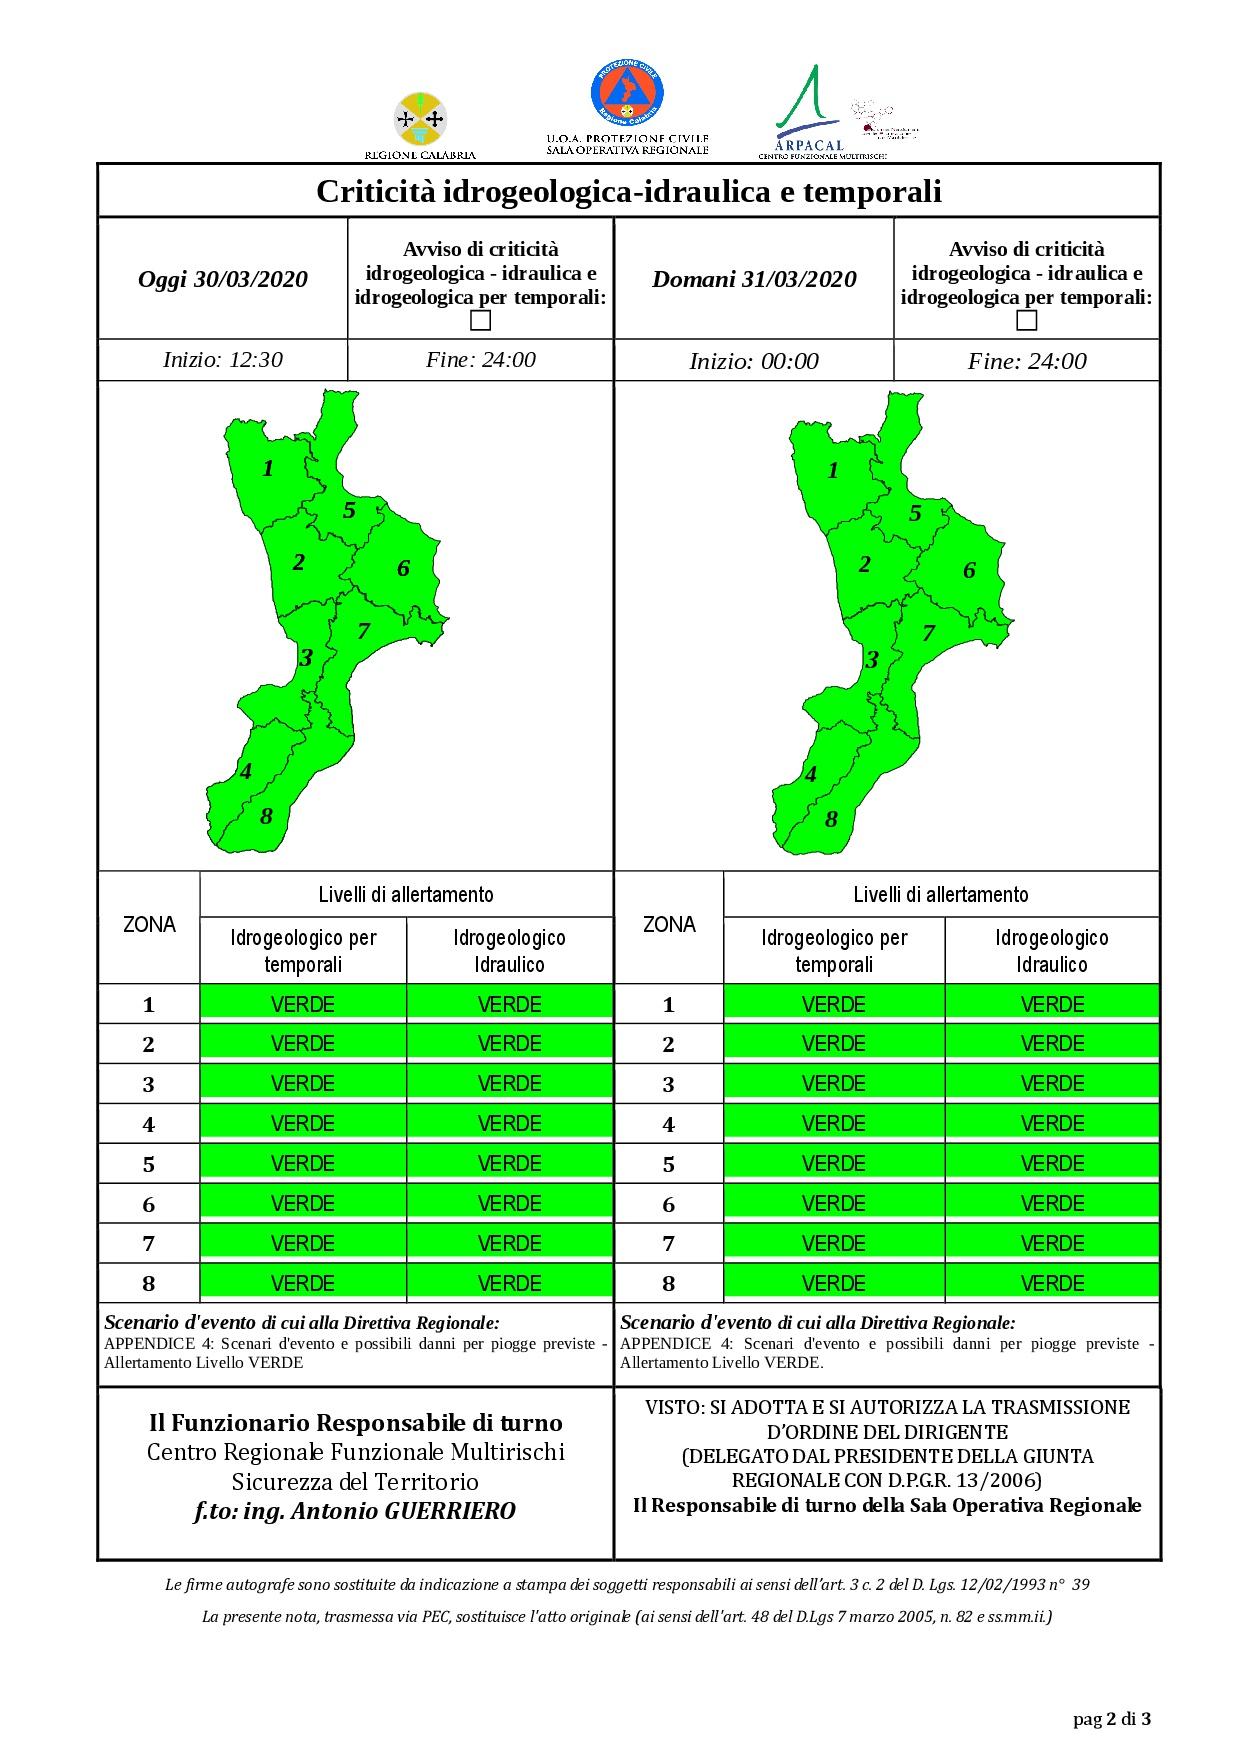 Criticità idrogeologica-idraulica e temporali in Calabria 30-03-2020